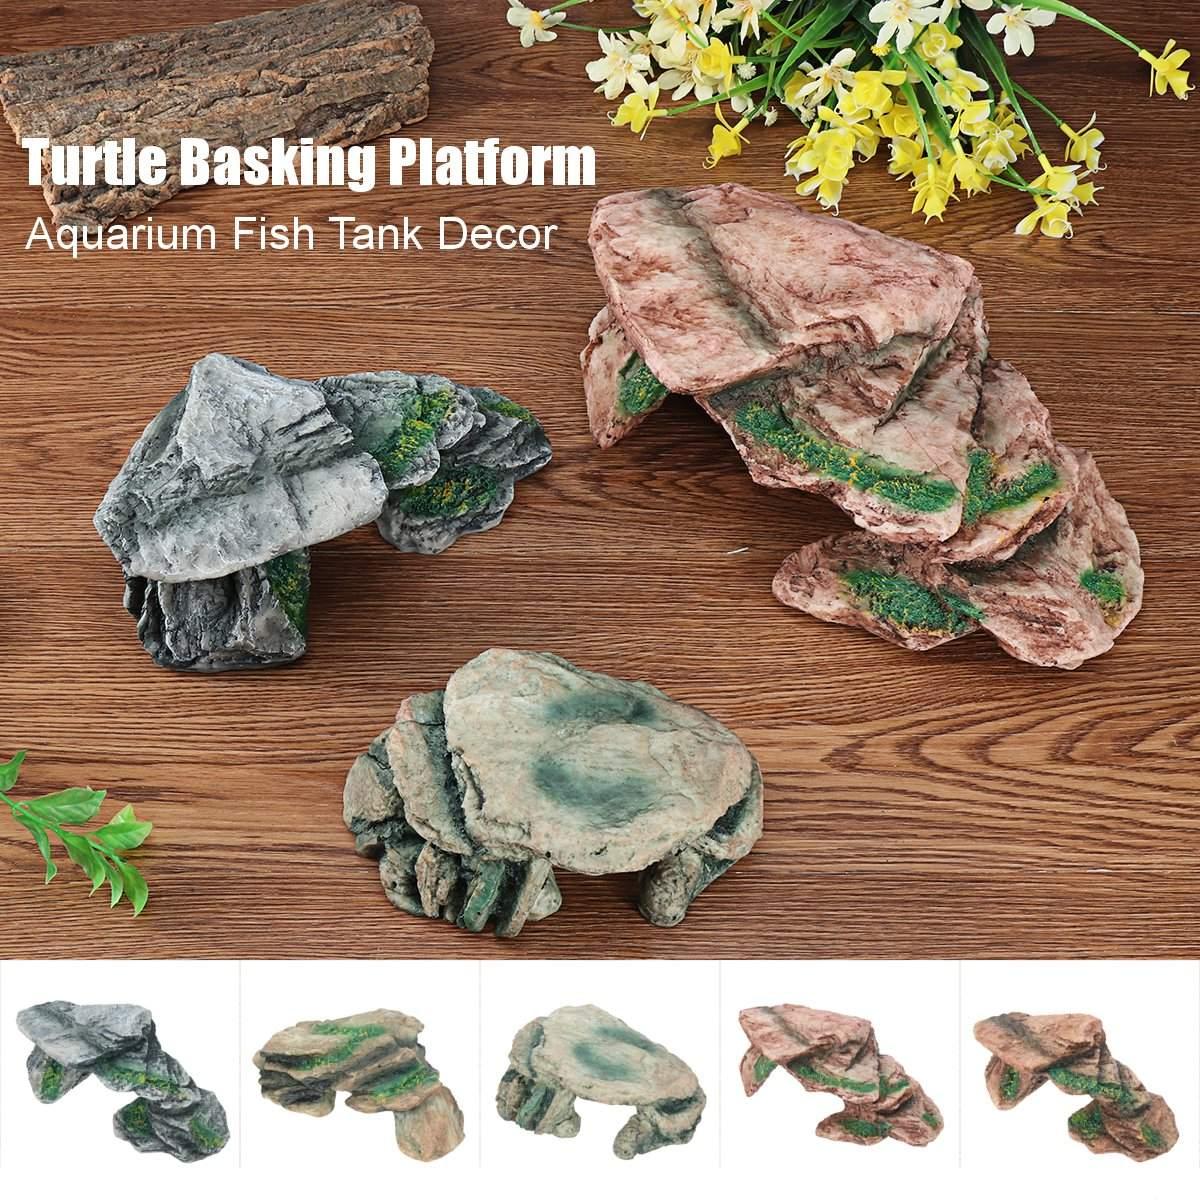 Resin Turtle Basking Platform Aquarium Fish Tank Tortoise Ramp Island Mountain Ornaments Reptiles Habitat Decoration 6 Patterns